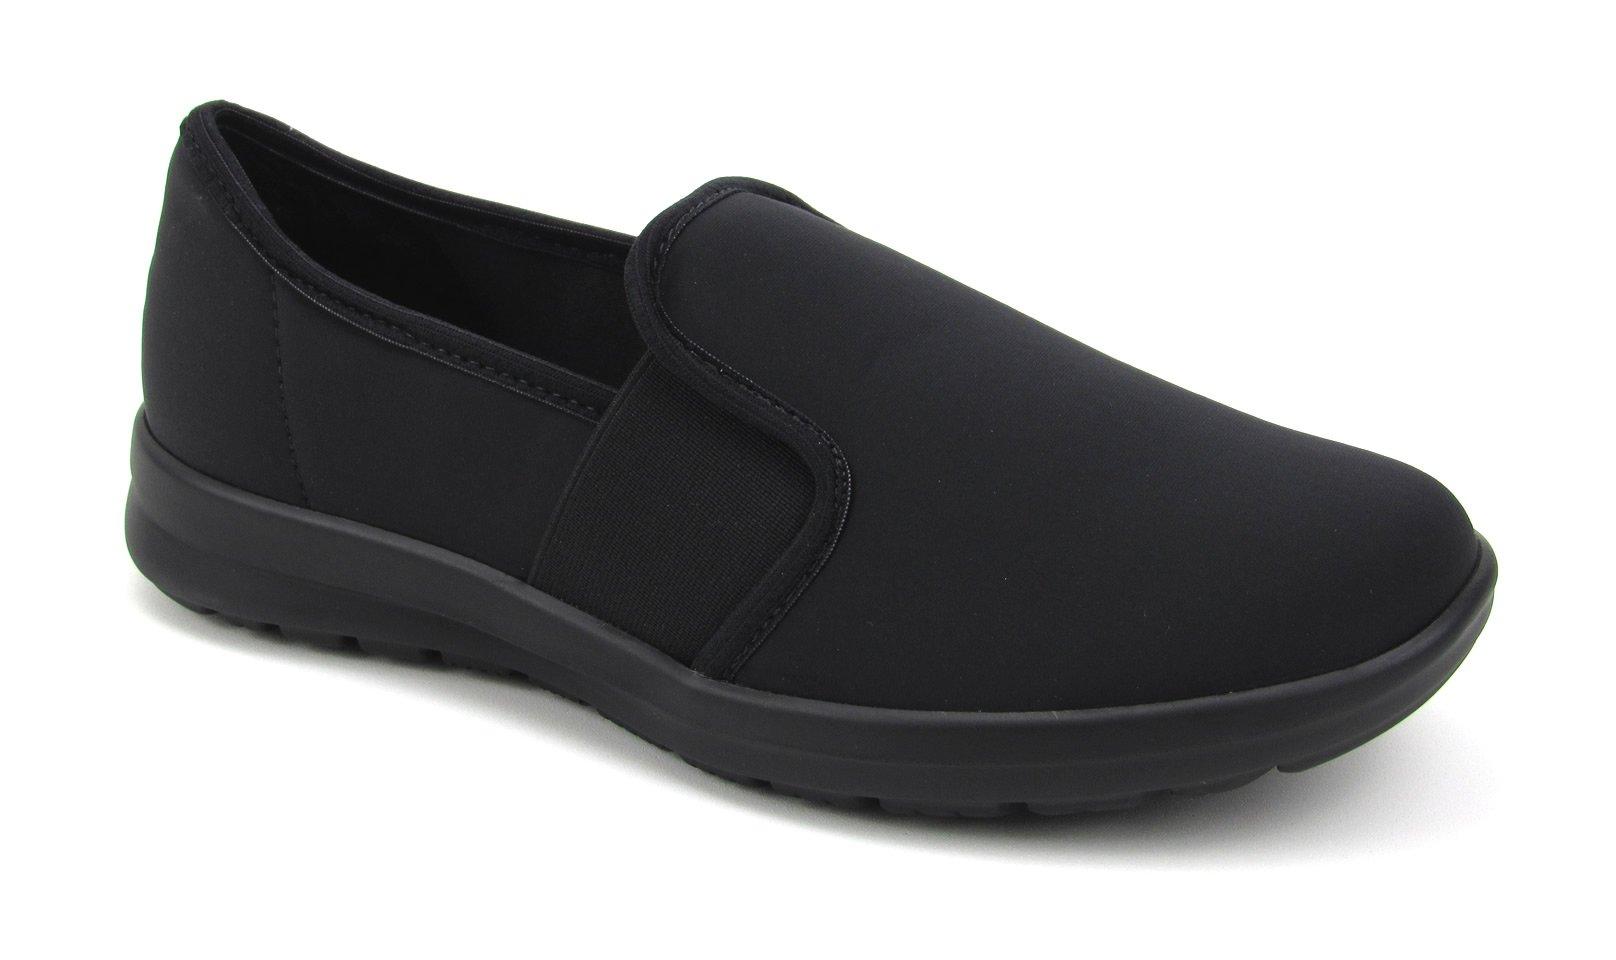 Women's Cute Memory Foam Elastic Gore Nursing Shoes - Printed - Florence Sunny (7, Black)